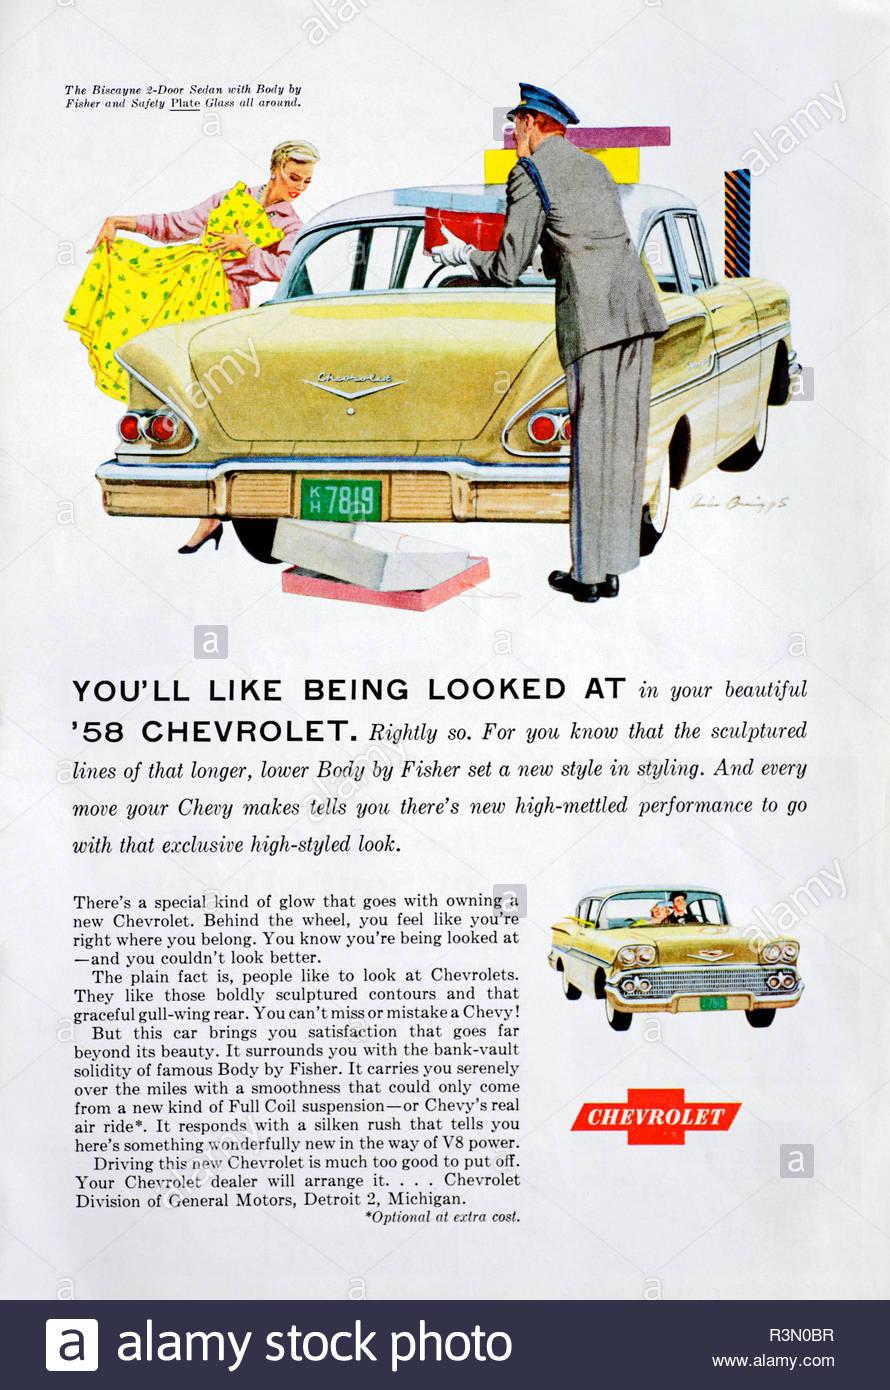 Vintage advertising for the Chevrolet Biscayne Sedan Car 1958 - Stock Image